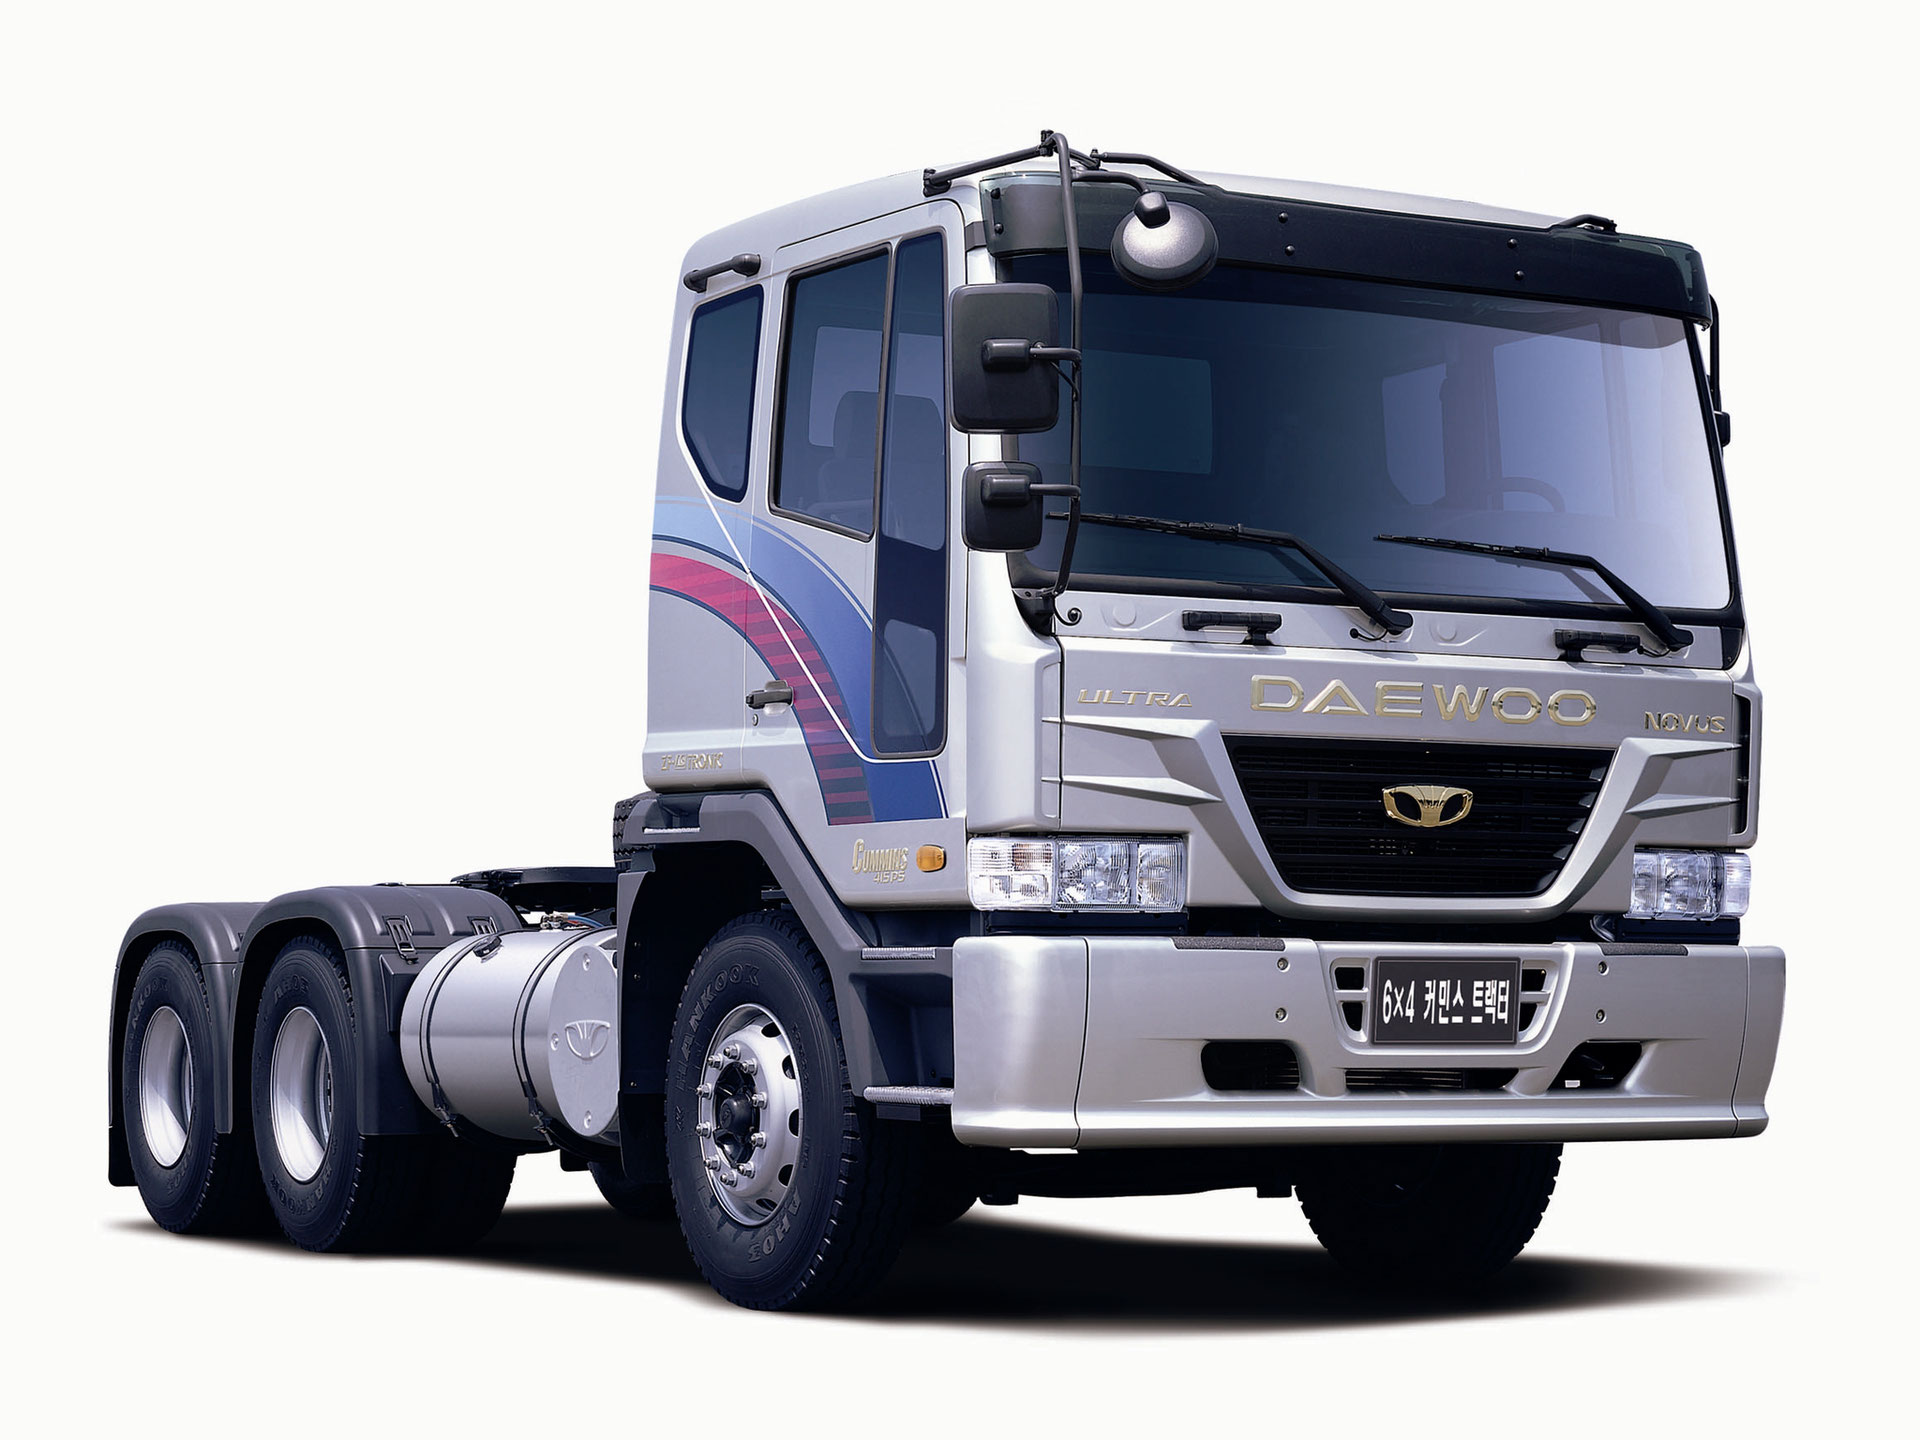 Jcb Wiring Schematic 9 Daewoo Trucks Service Manuals Free Download Free Pdf